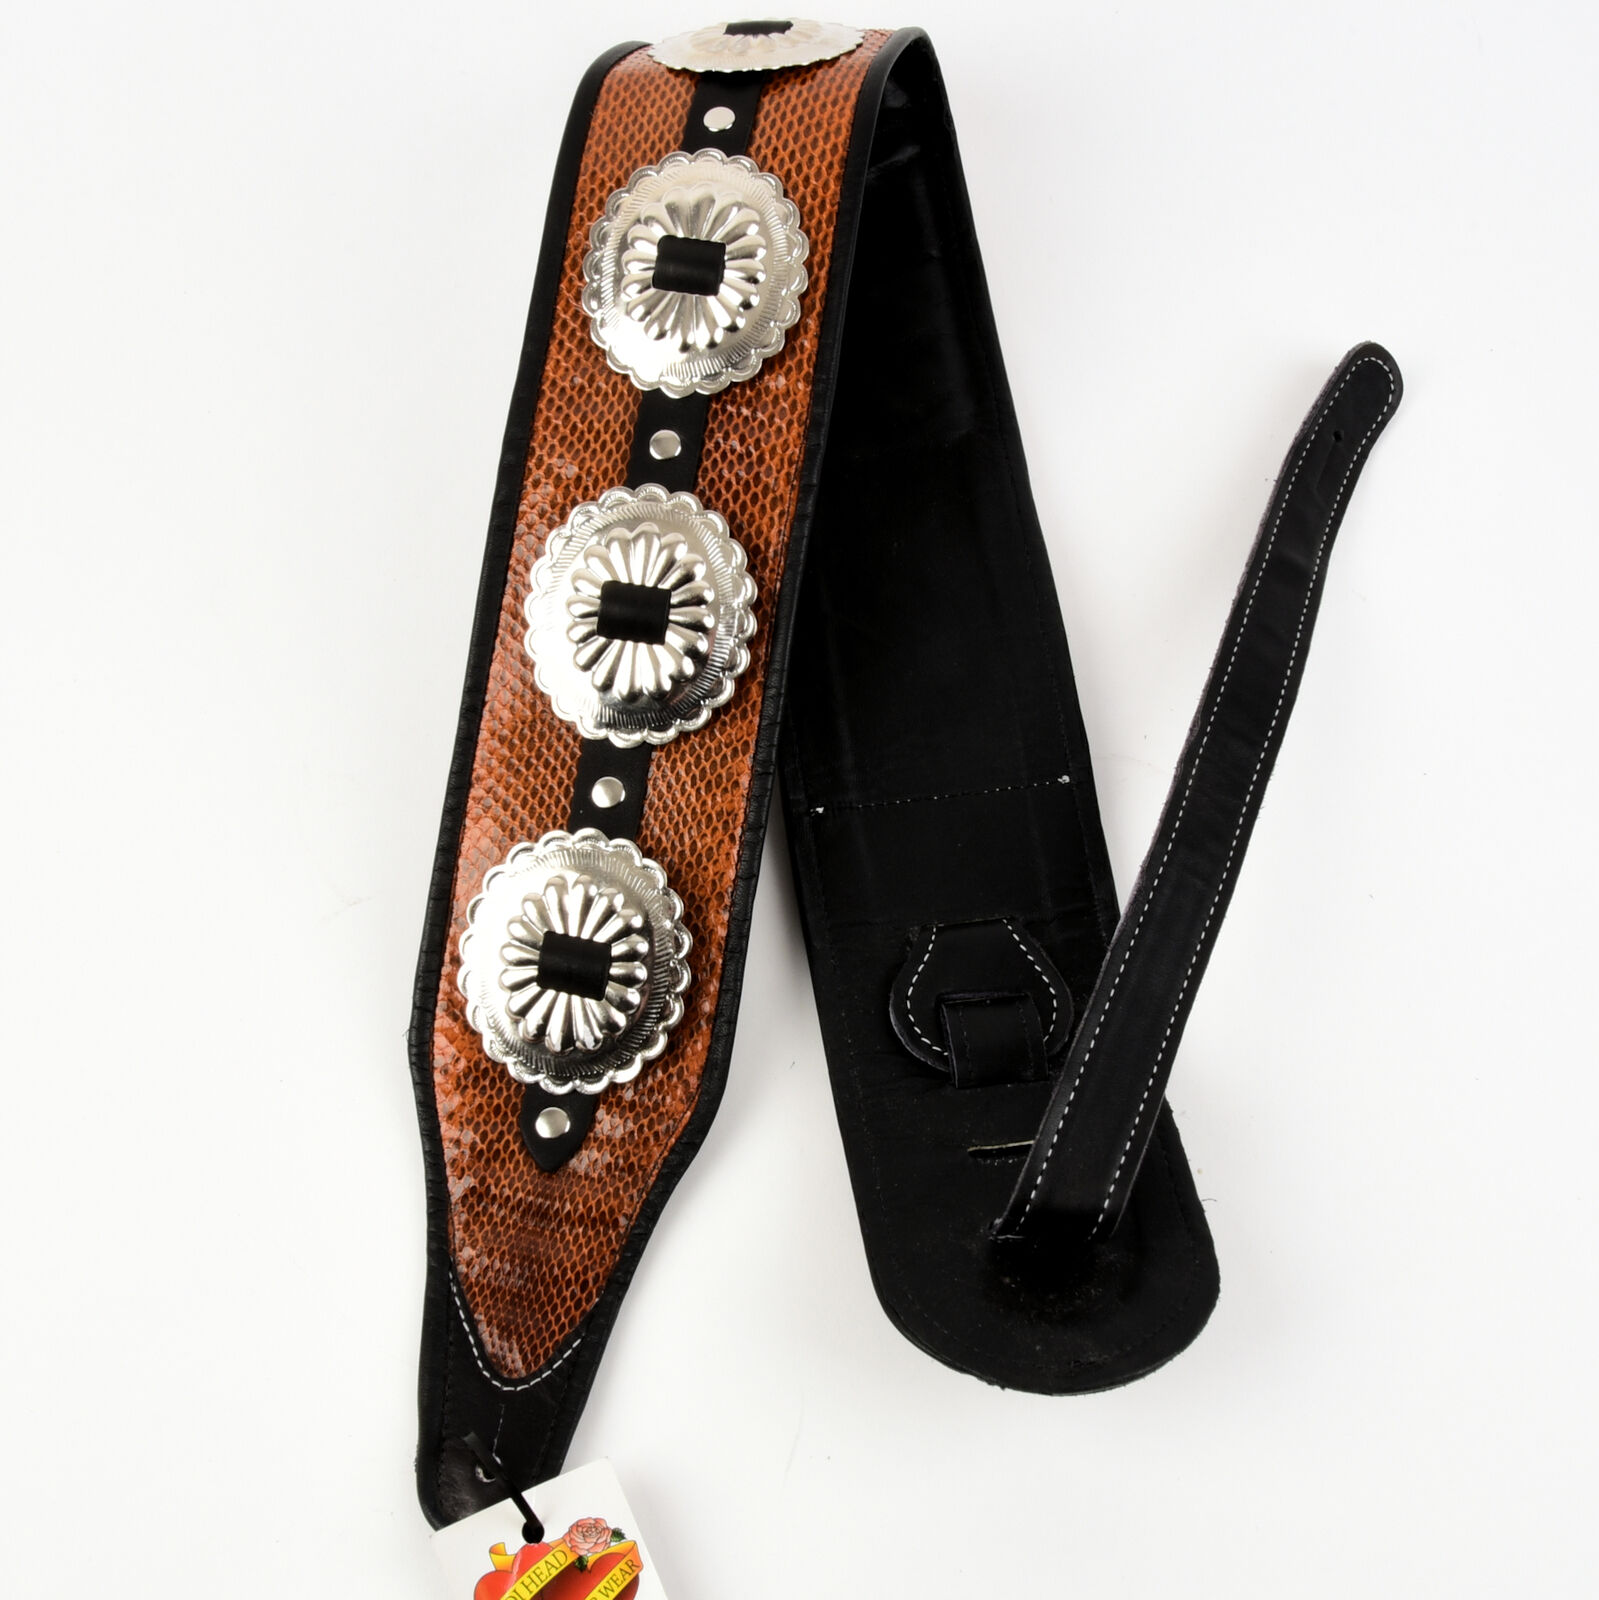 Jodi Head Handmade Leather Guitar Strap - Concho